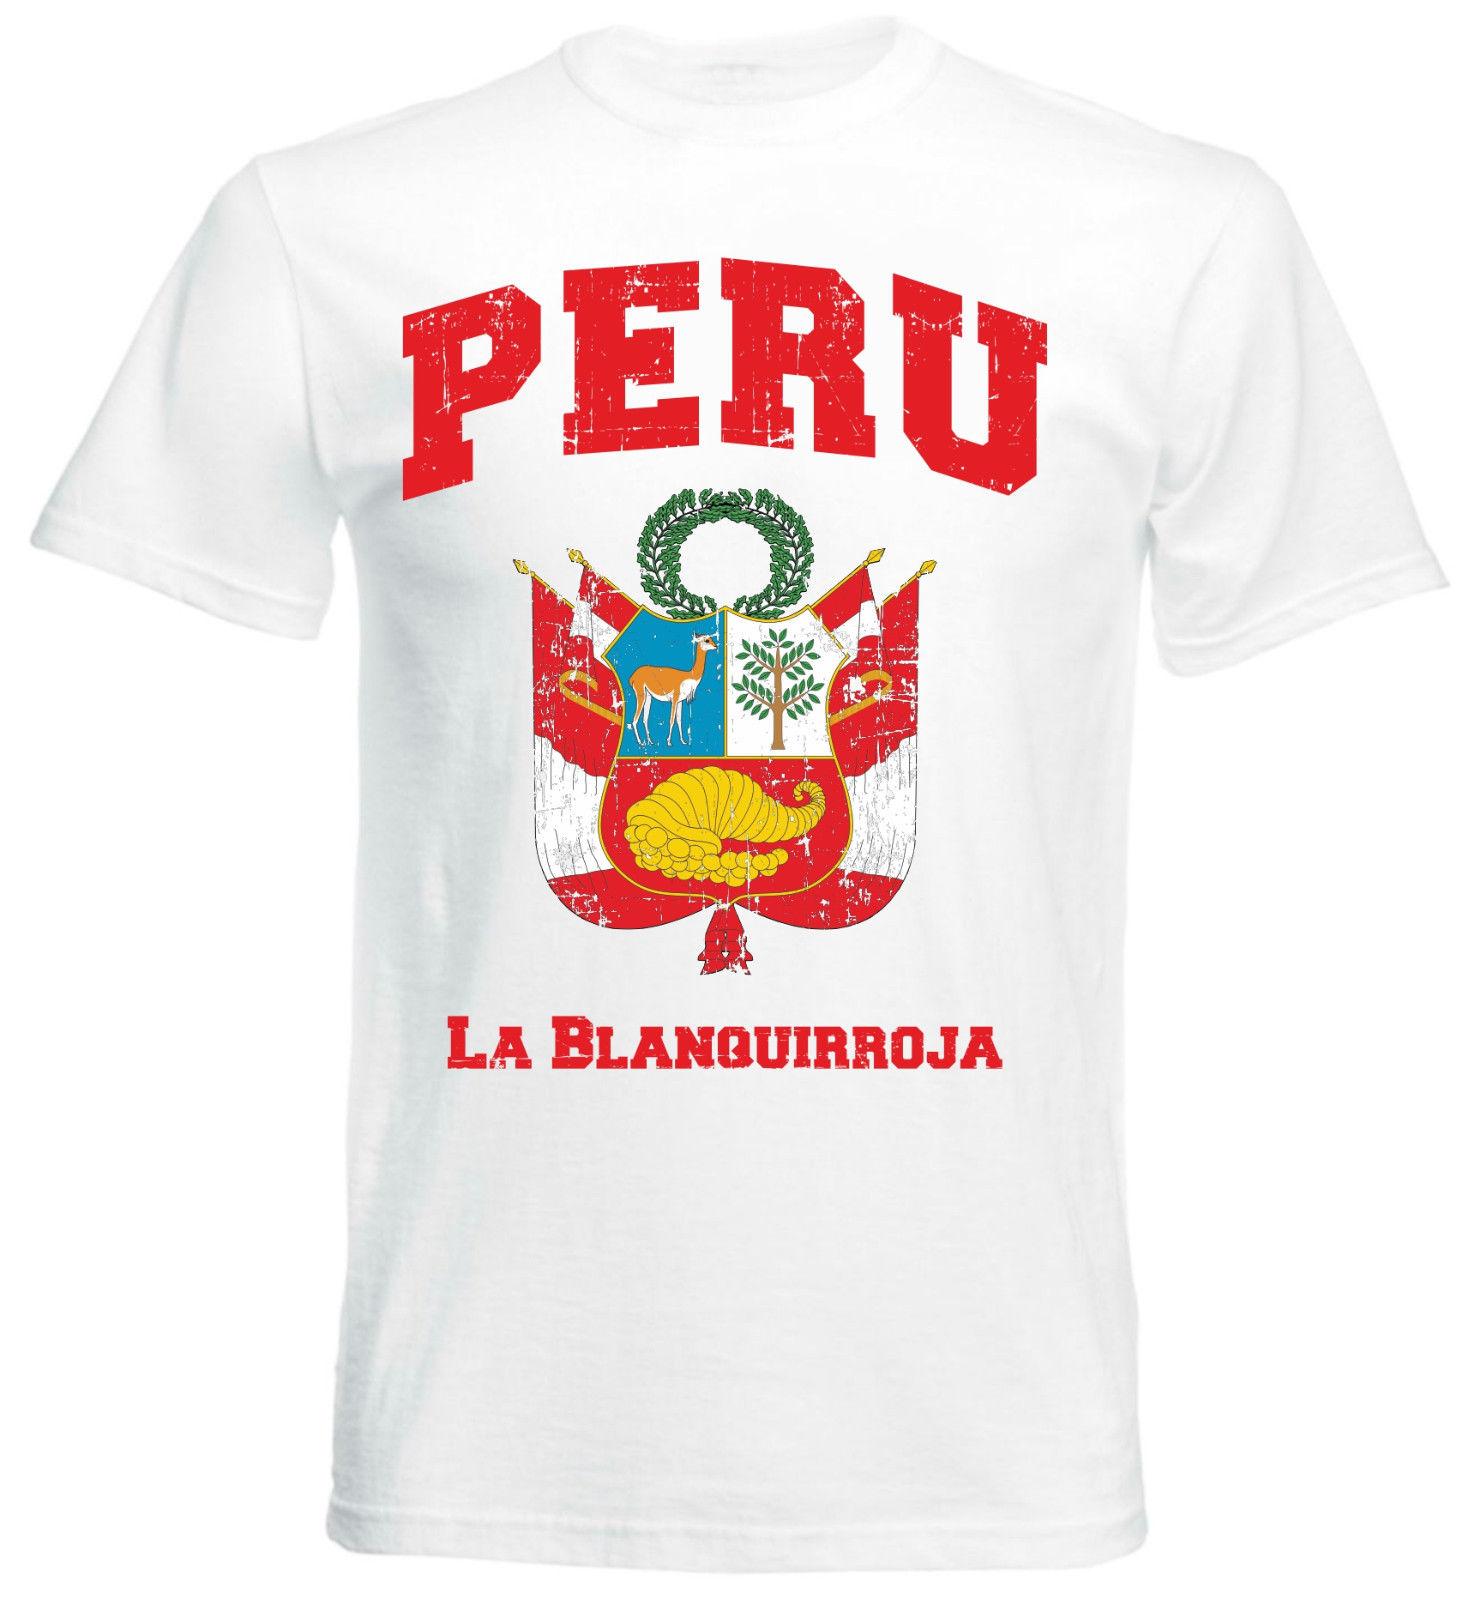 >T-Shirt <font><b>Peru</b></font> White Futbol Footballer Soccers <font><b>2018</b></font> La Blanguirroja Lima Newest 2019 Men'S Fashion Hipster Summer Funny Cotton Tee